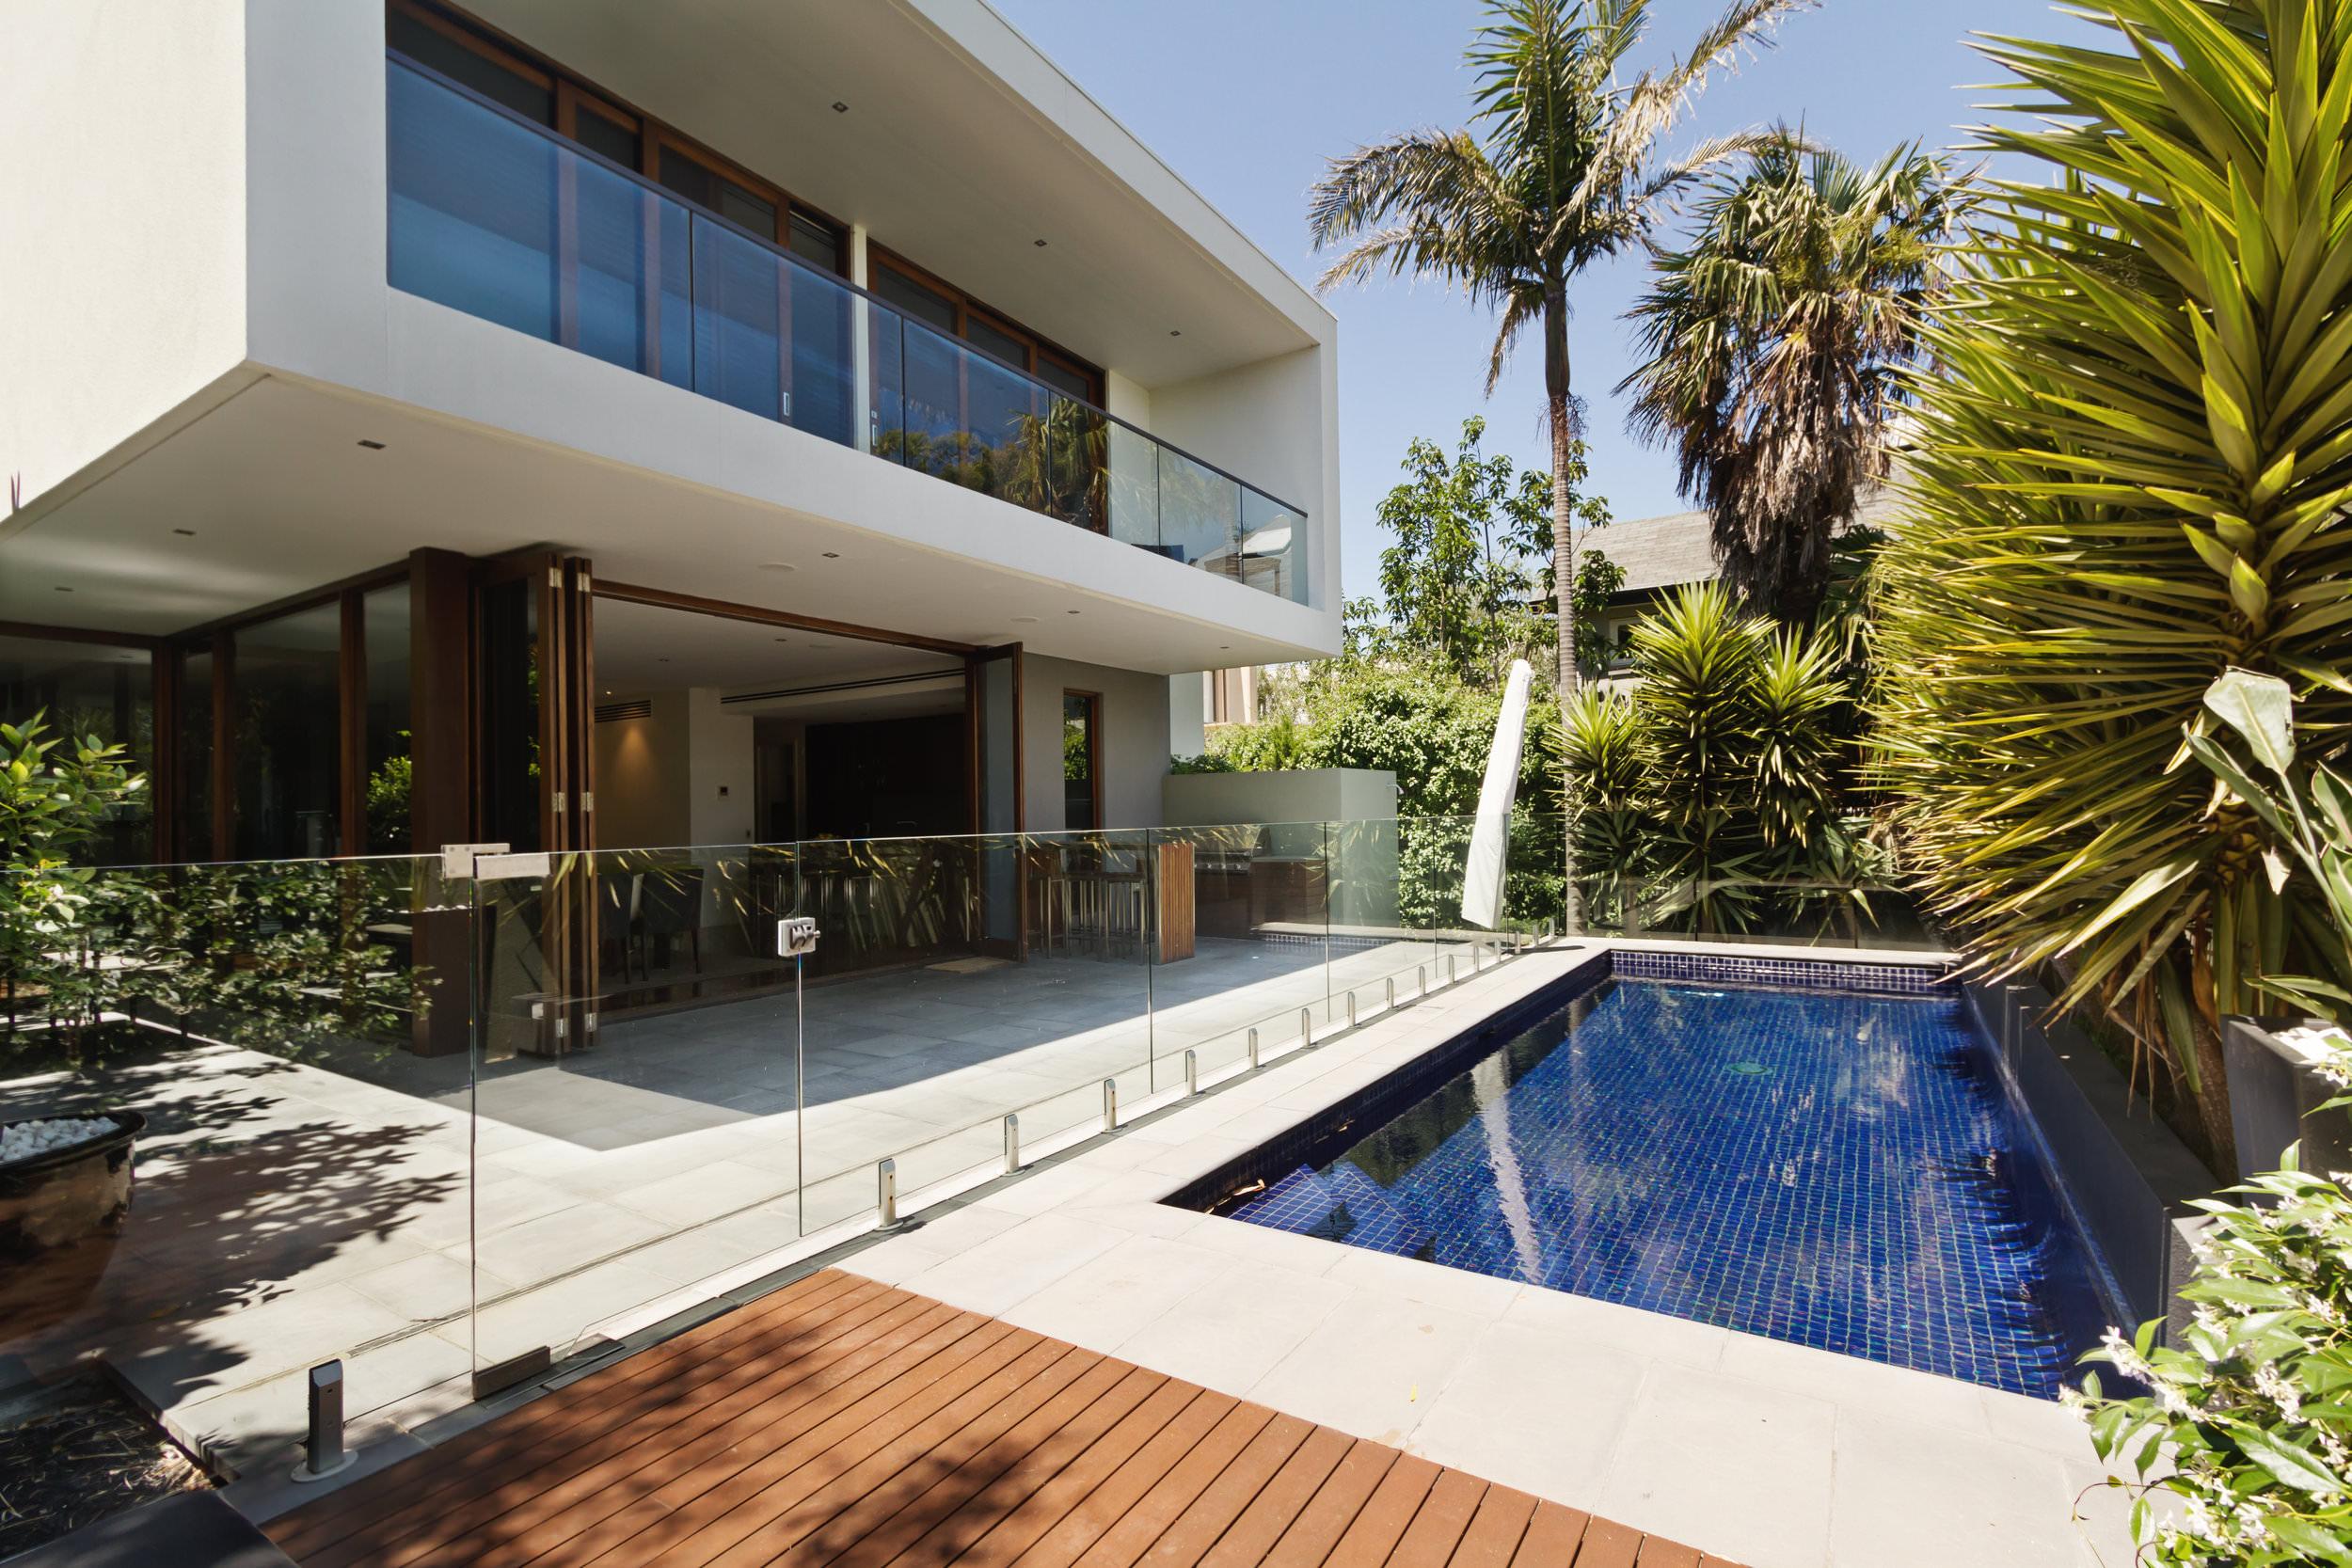 Pool remodel in Southern California